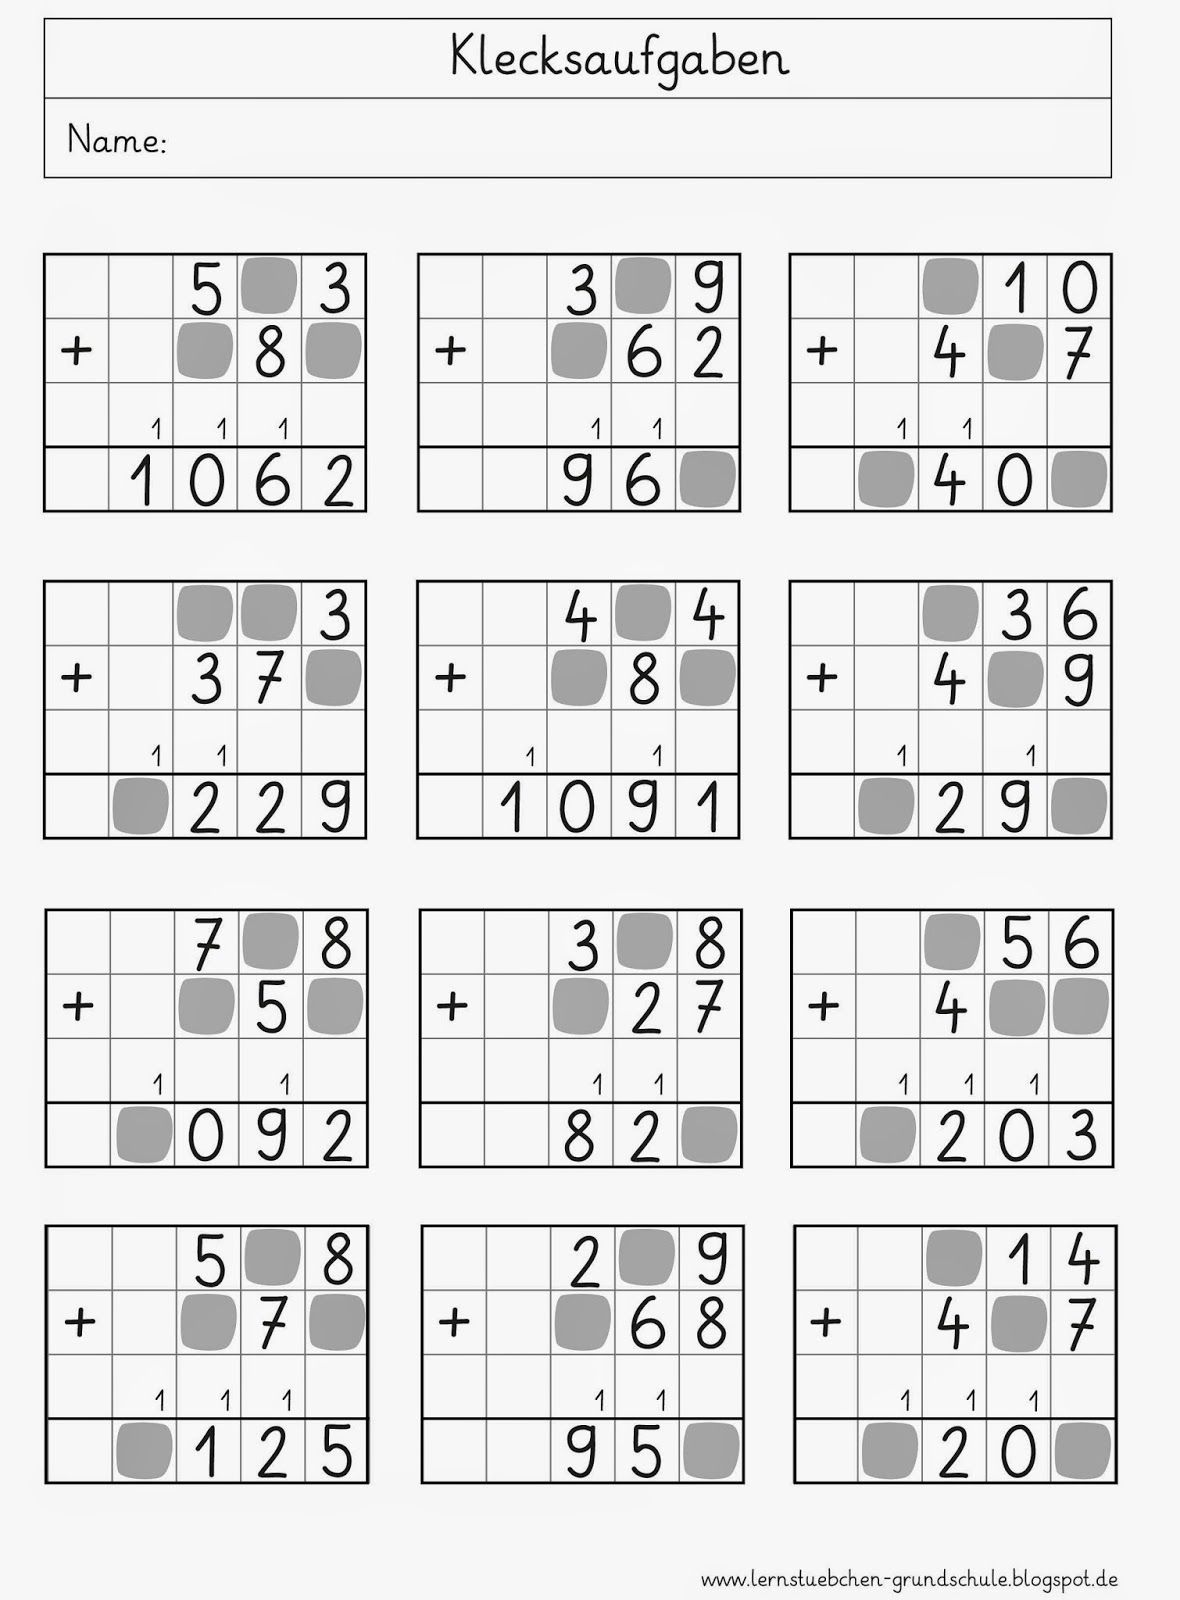 Lernstübchen: Klecksaufgaben | Jeux Mathématiques | Pinterest ...